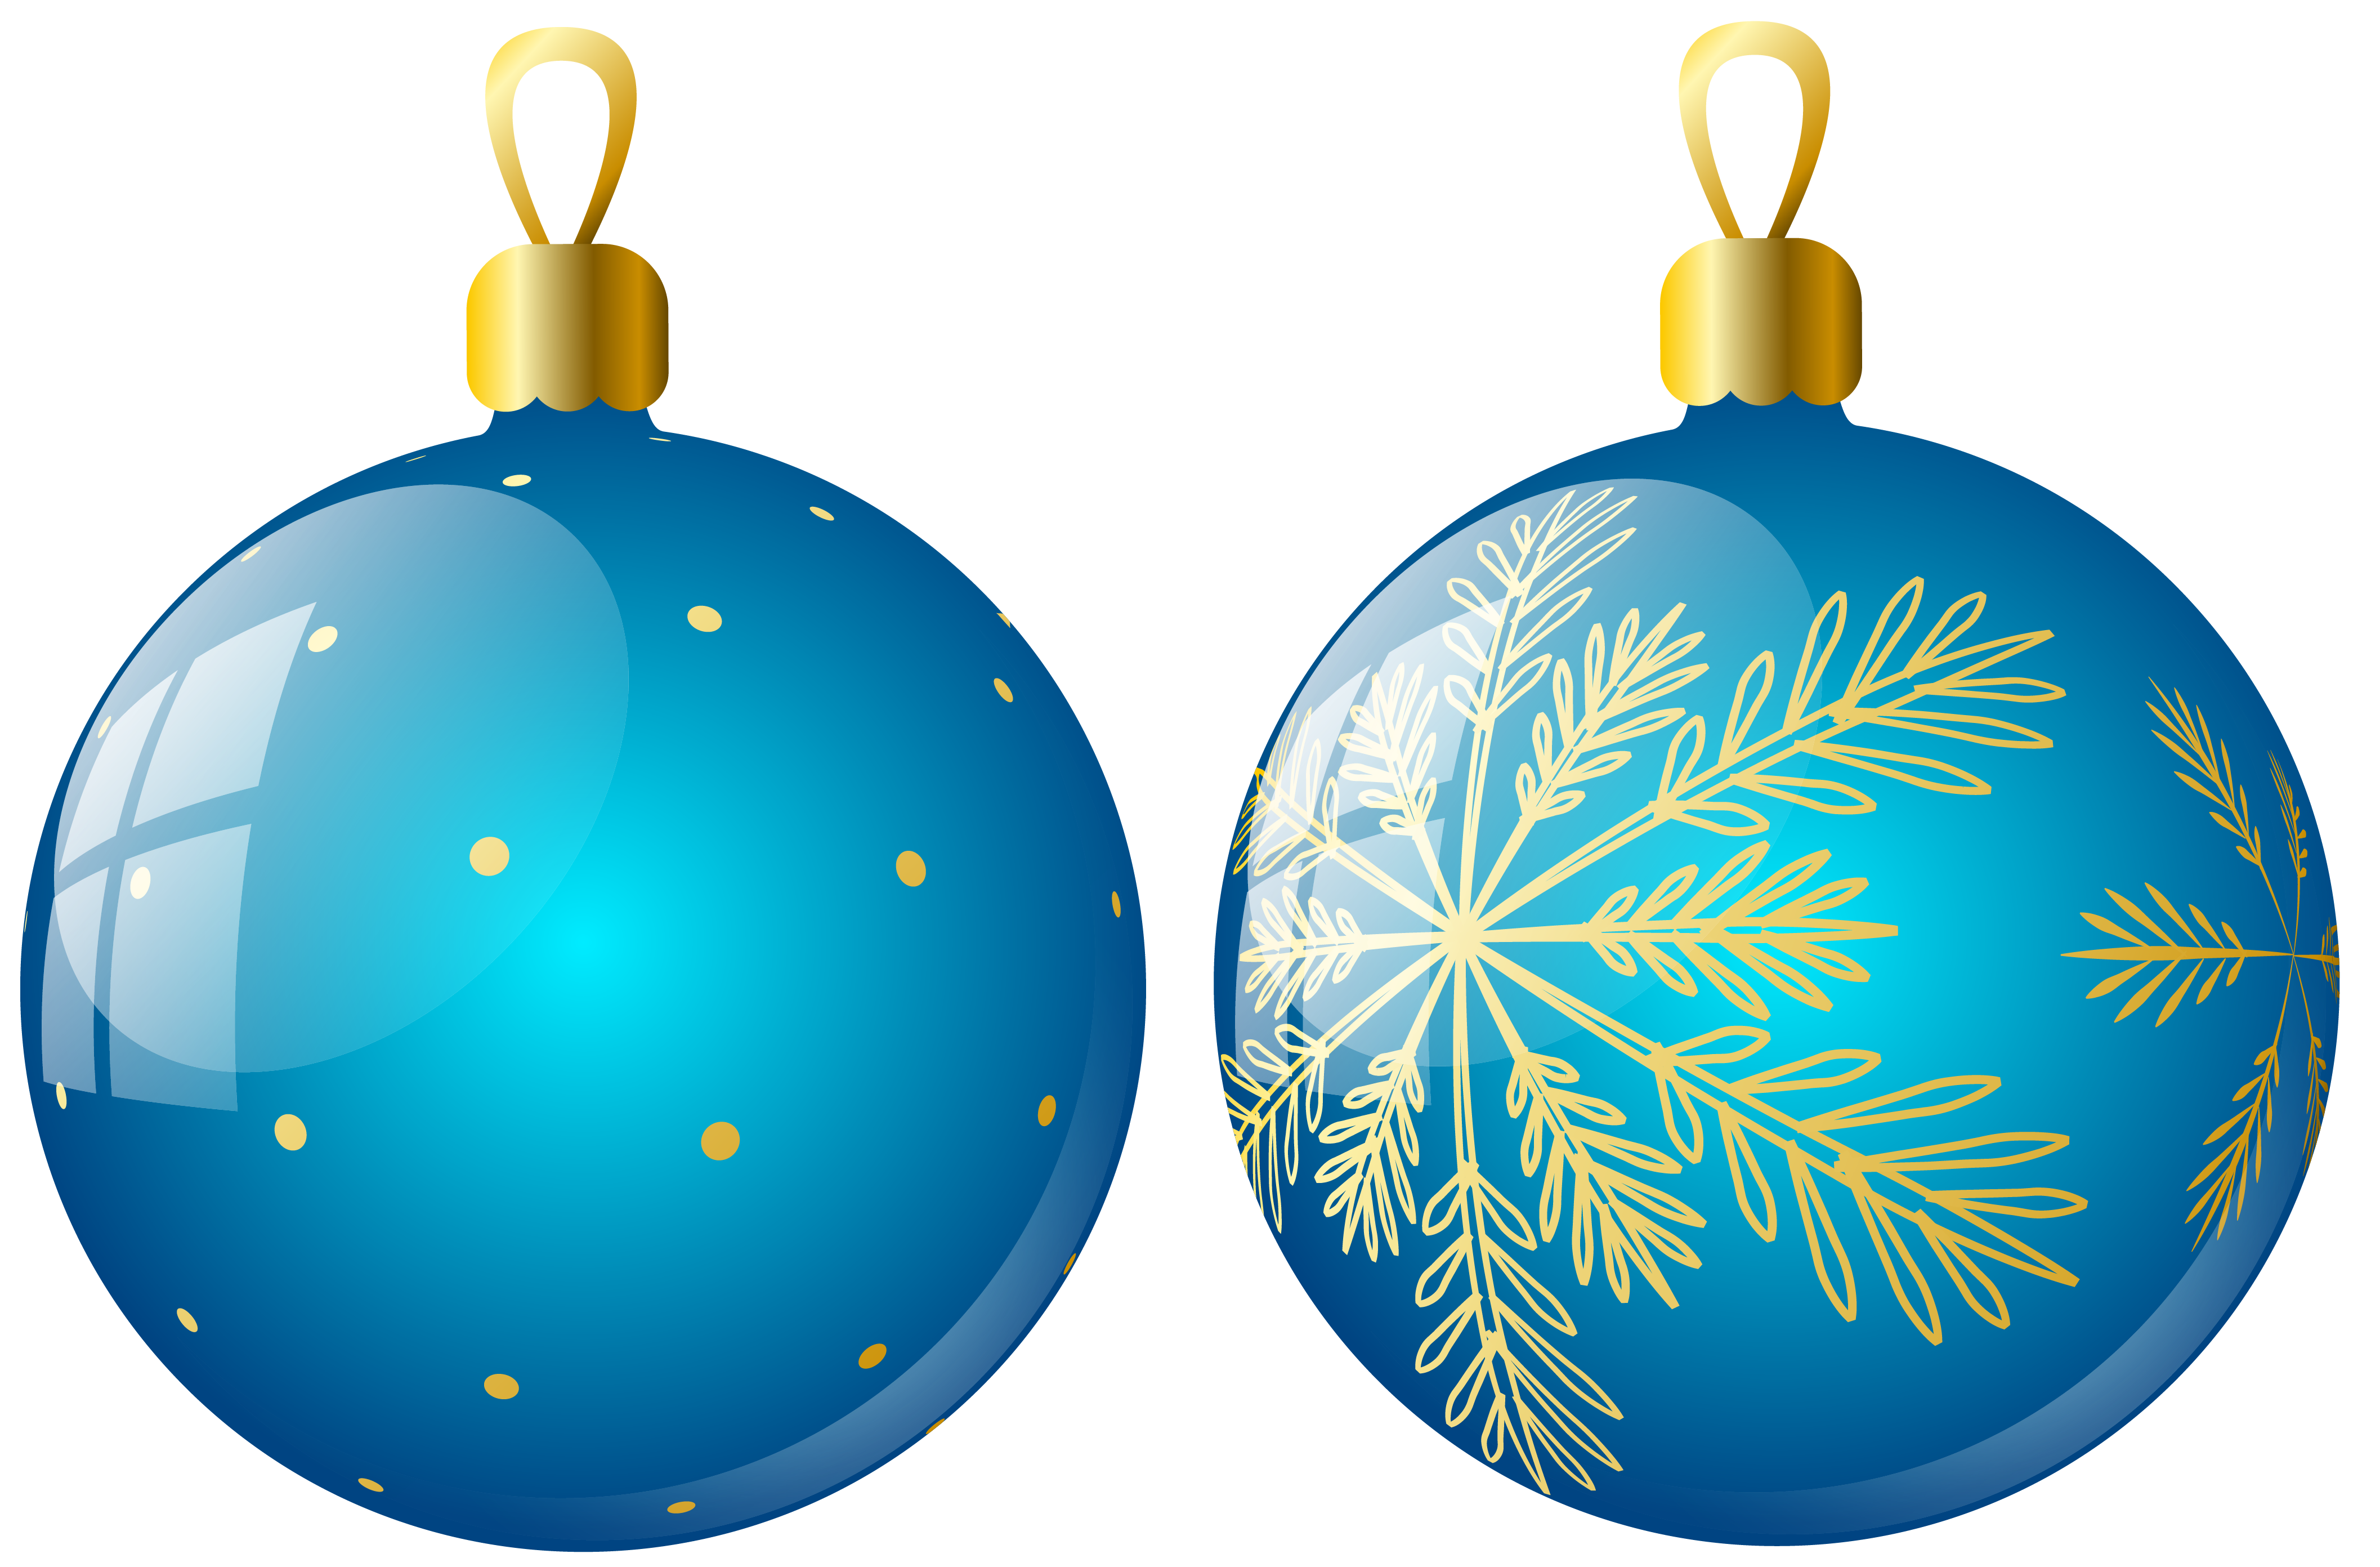 Christmas Ornaments Clipart .-Christmas Ornaments Clipart .-14